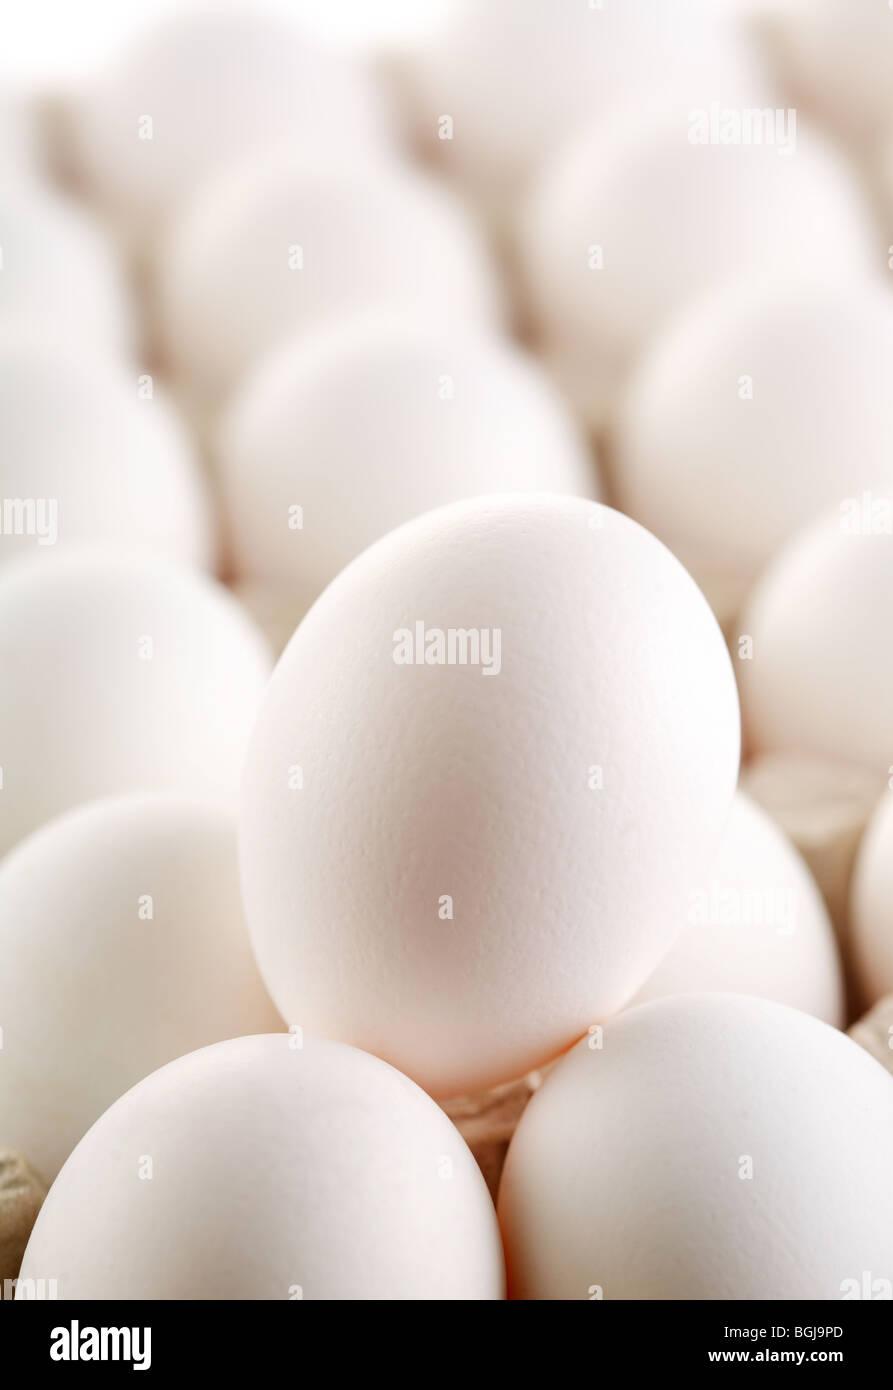 large white egg whites of eggs. - Stock Image